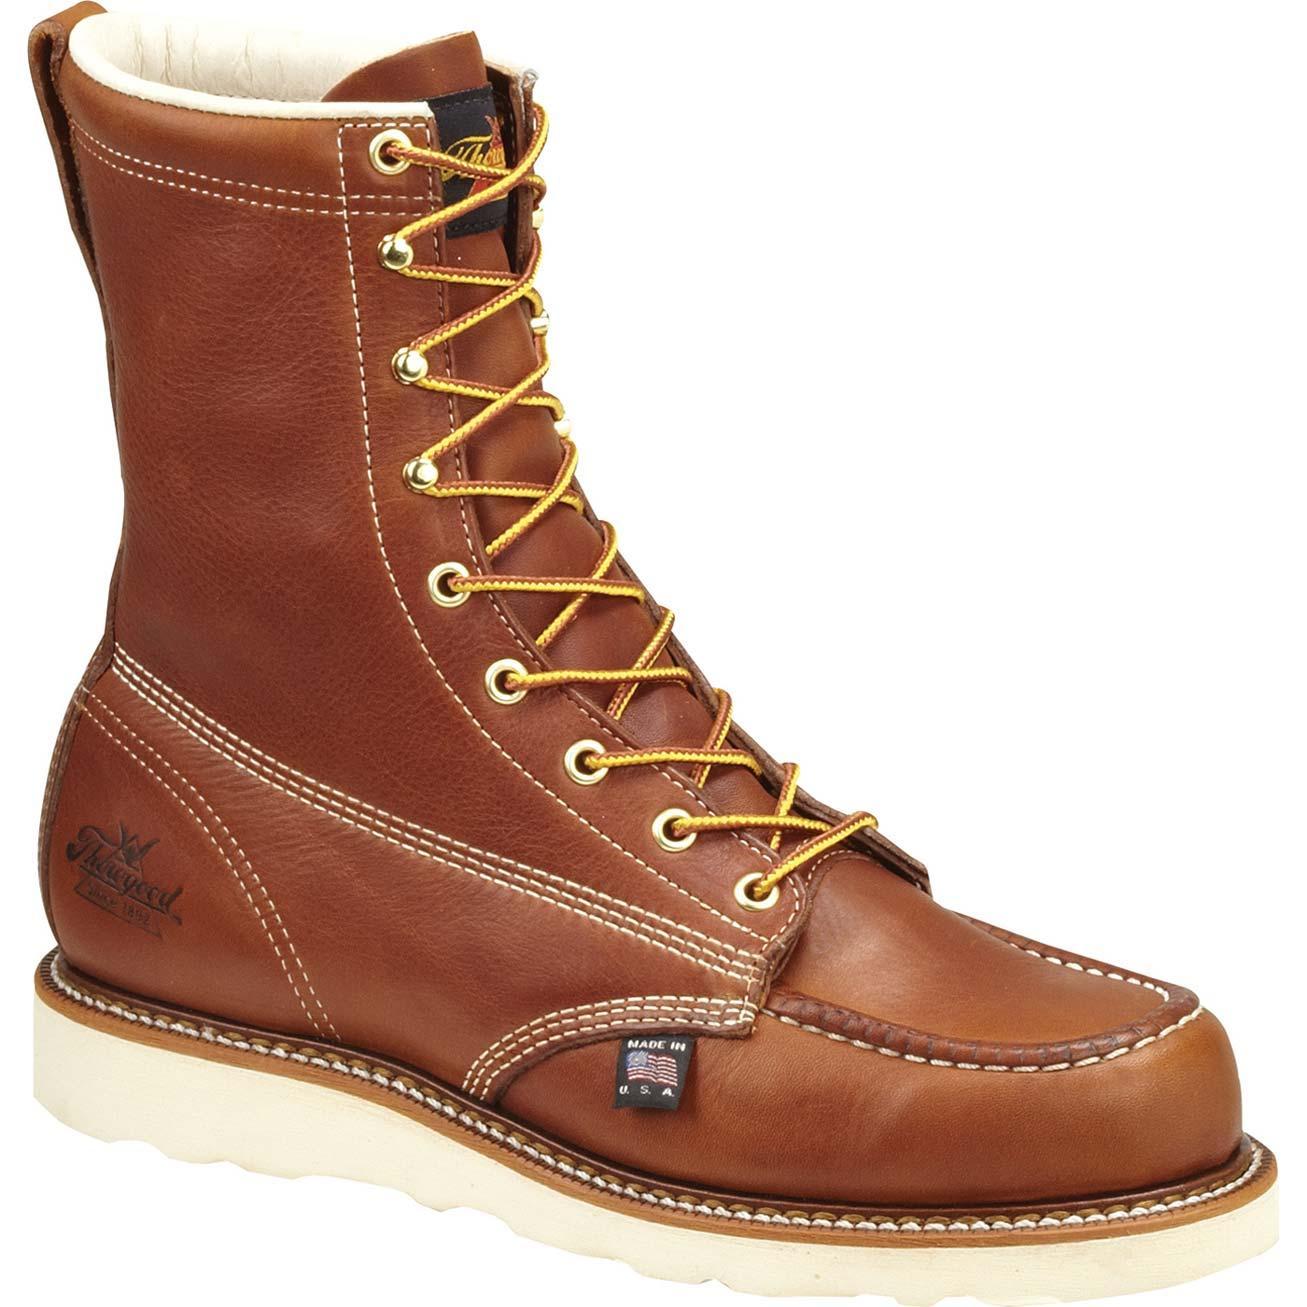 08285d473b4 Thorogood American Heritage Moc Toe Wedge Work Boot